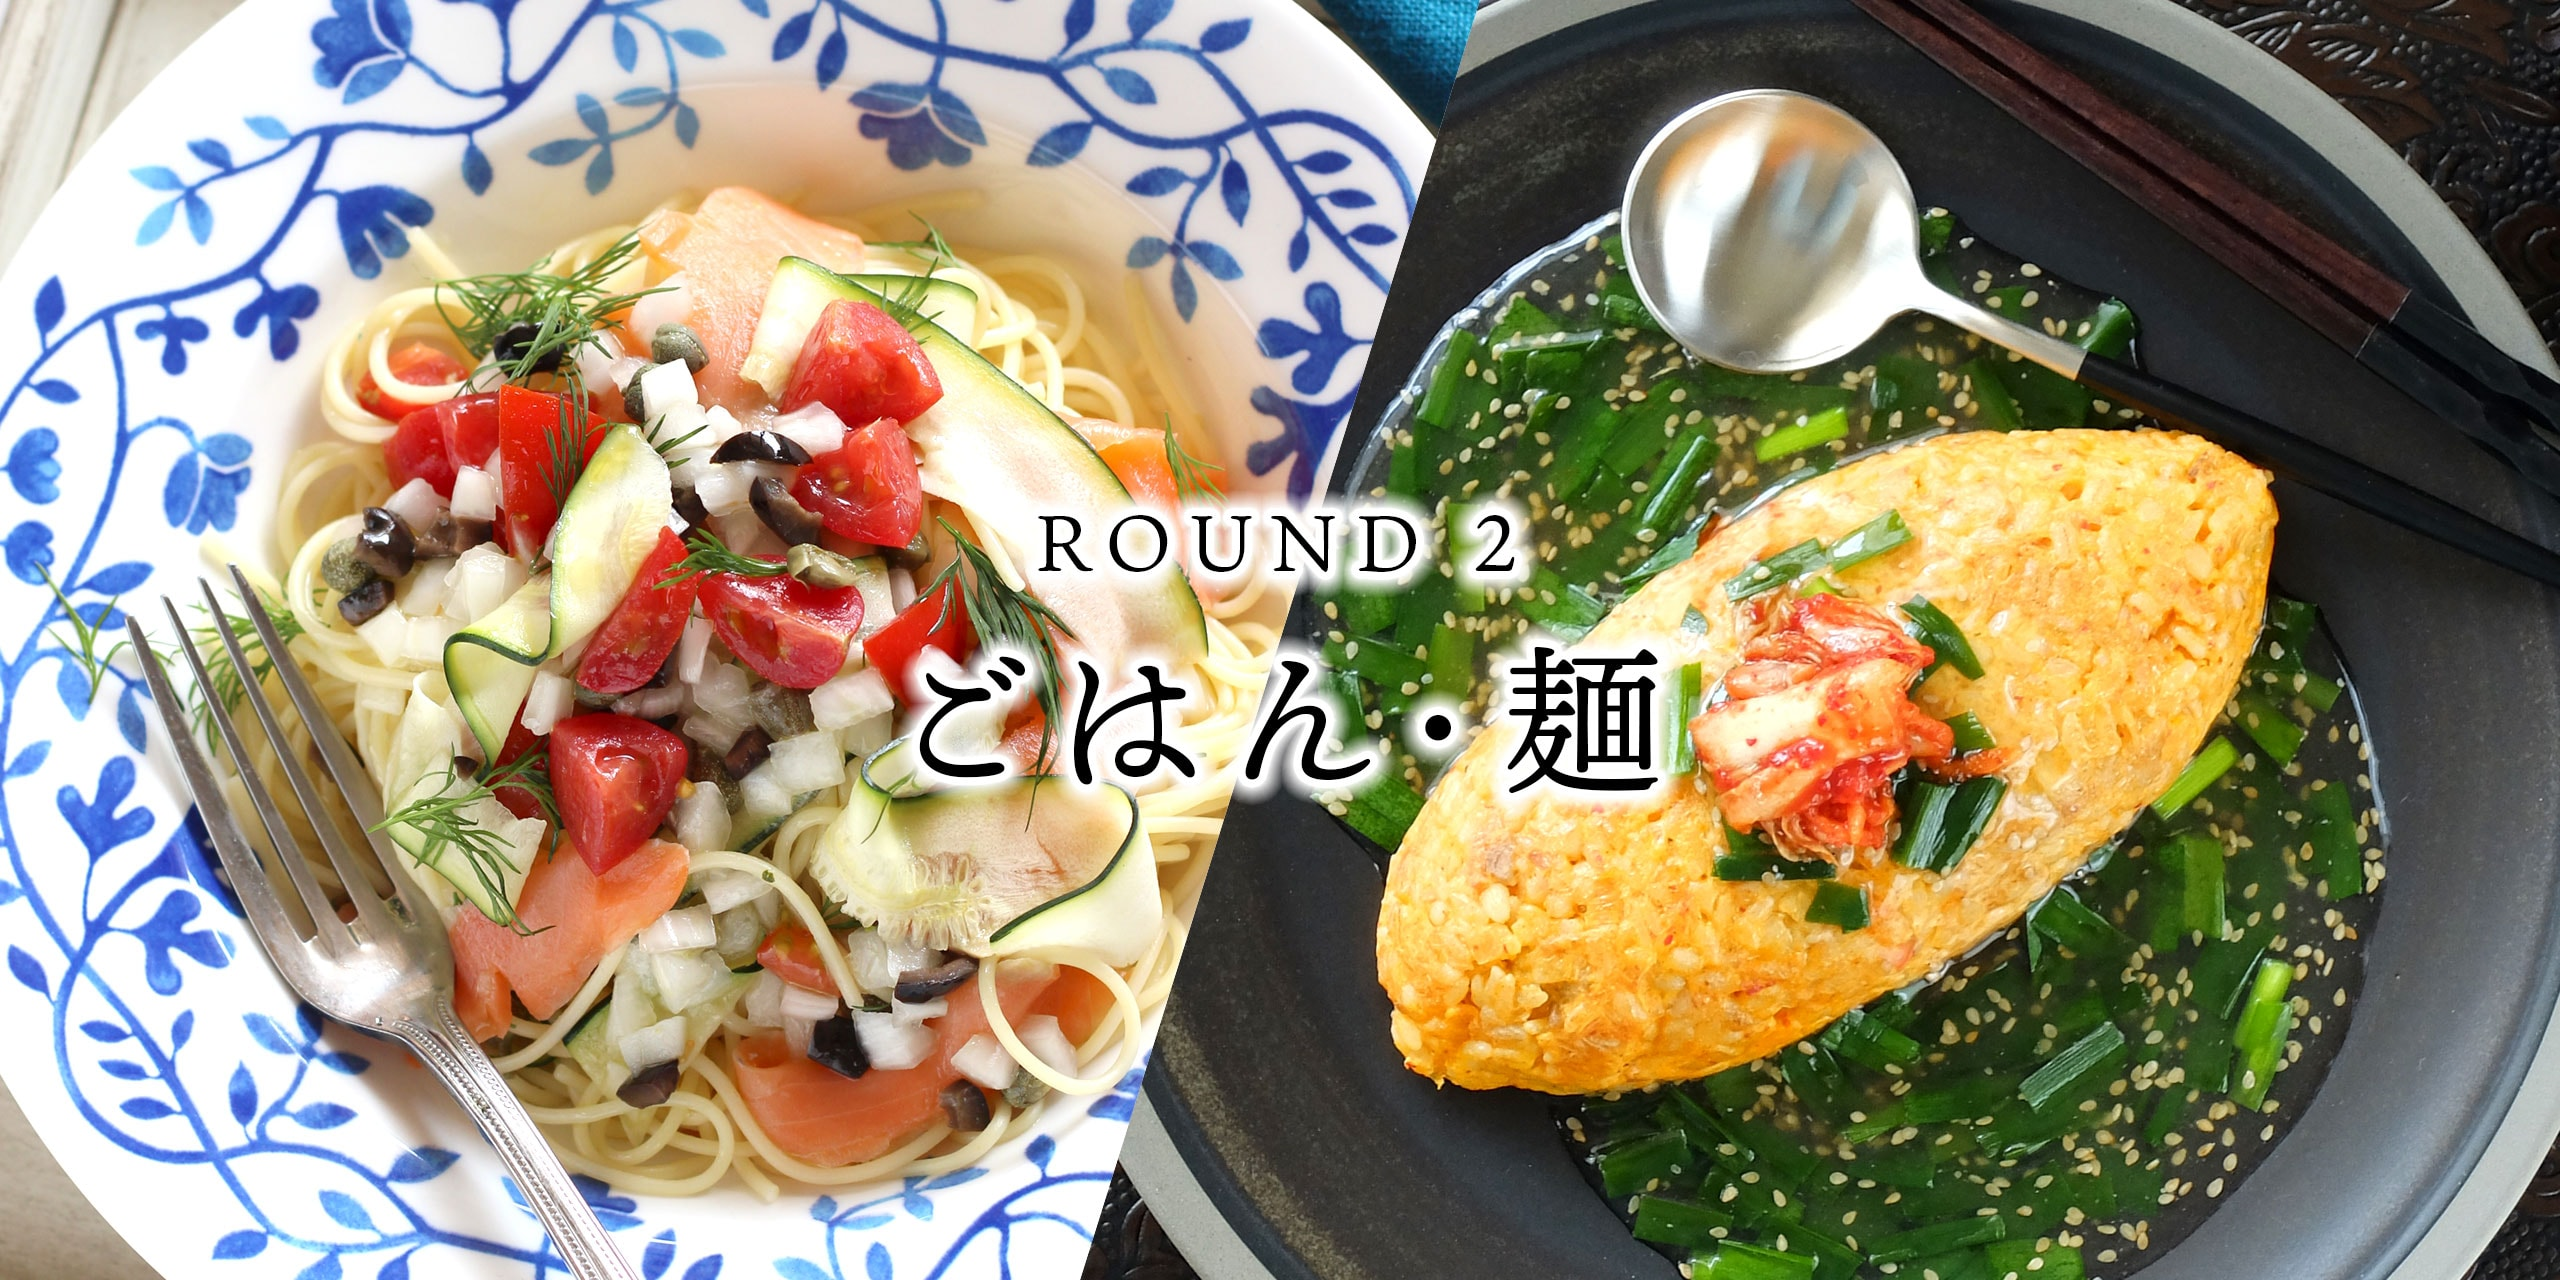 ROUND 2 ごはん・麺